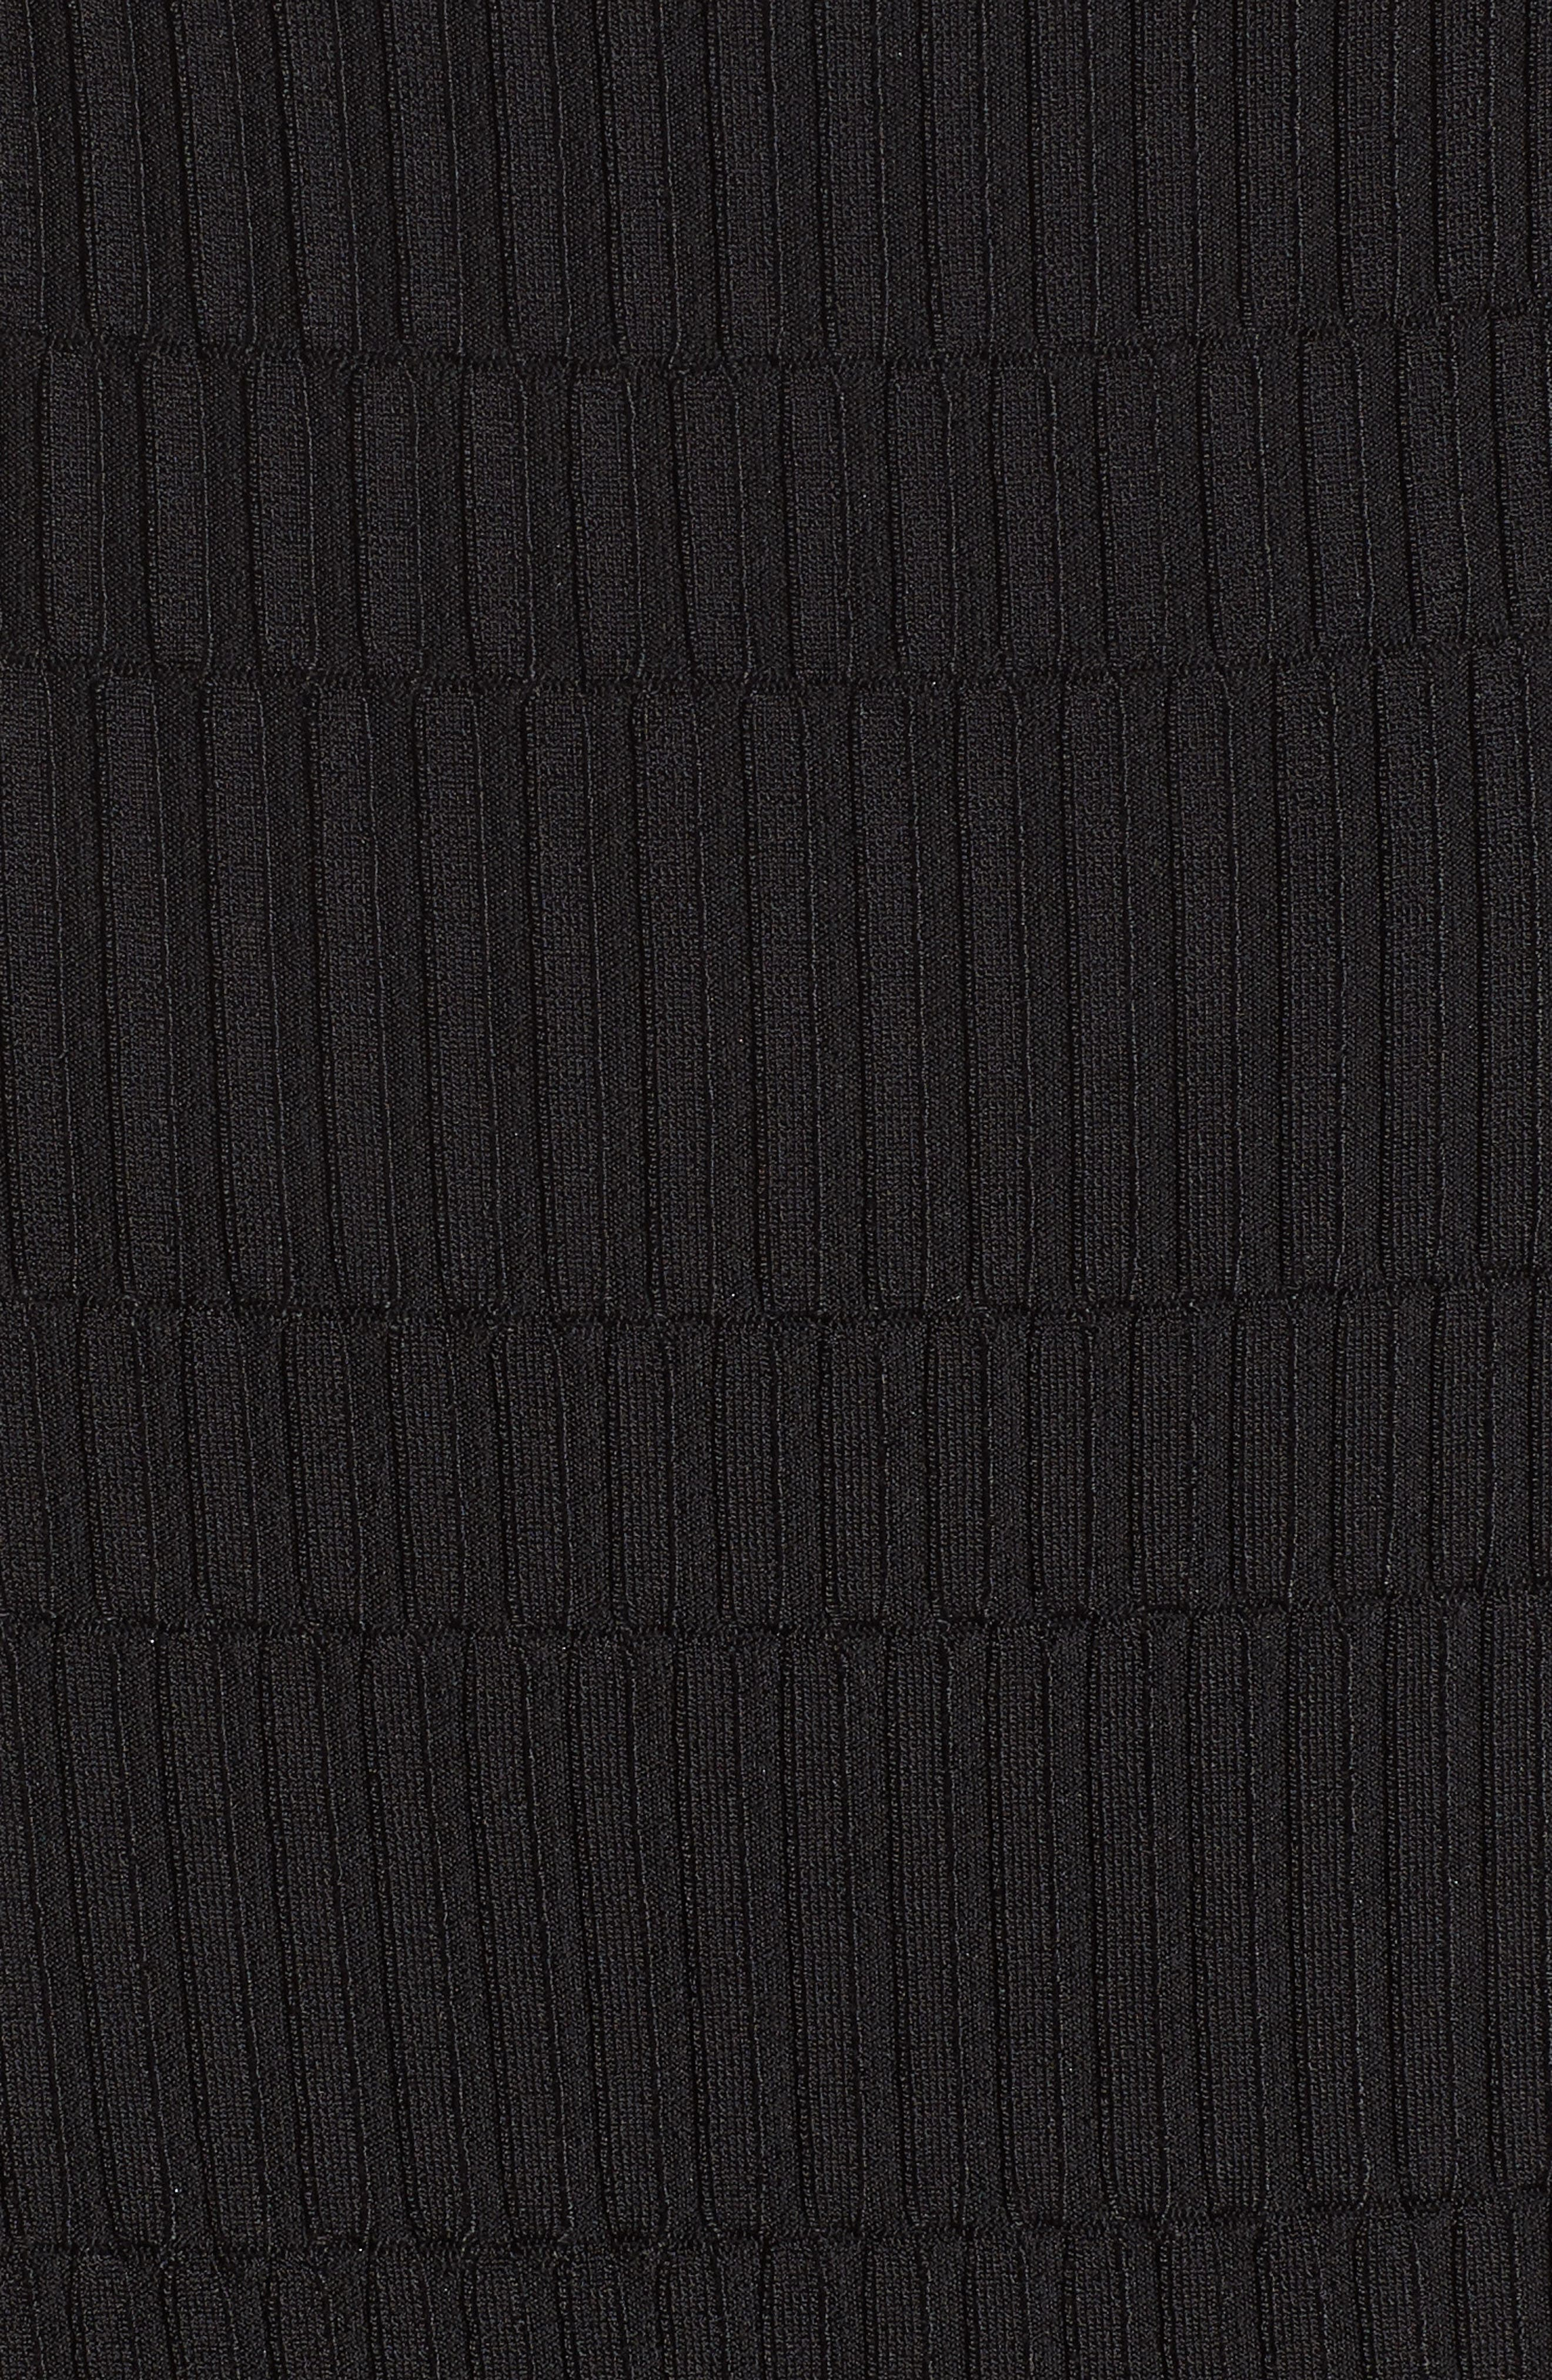 Tube Sweater Dress,                             Alternate thumbnail 5, color,                             Black